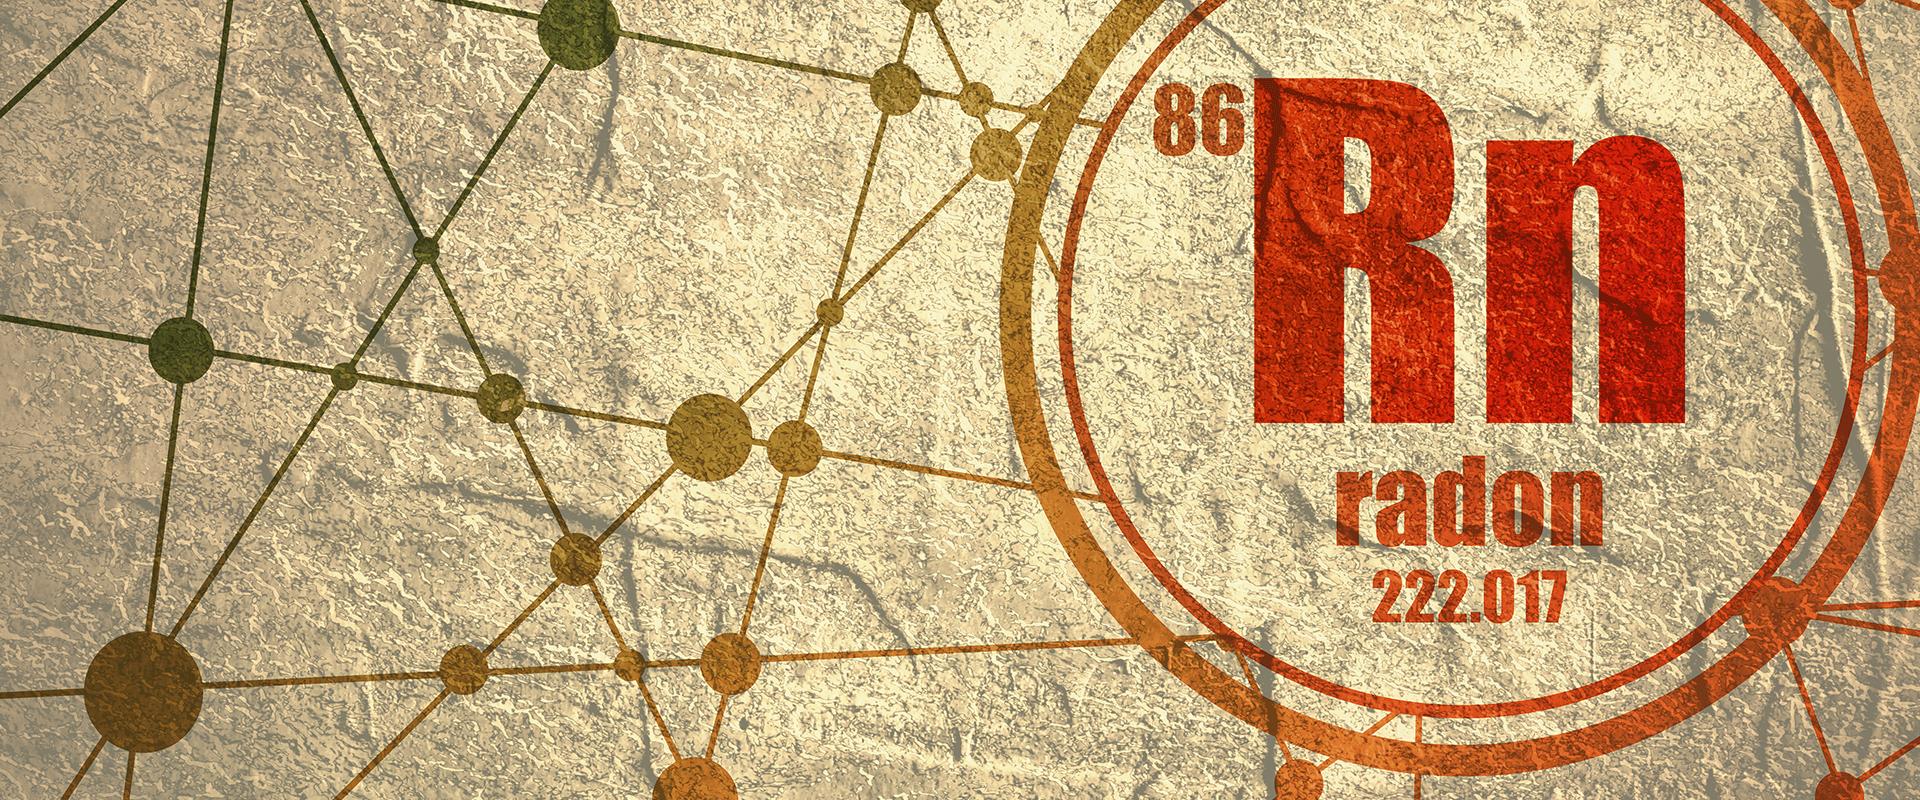 radon monitoring services graphic